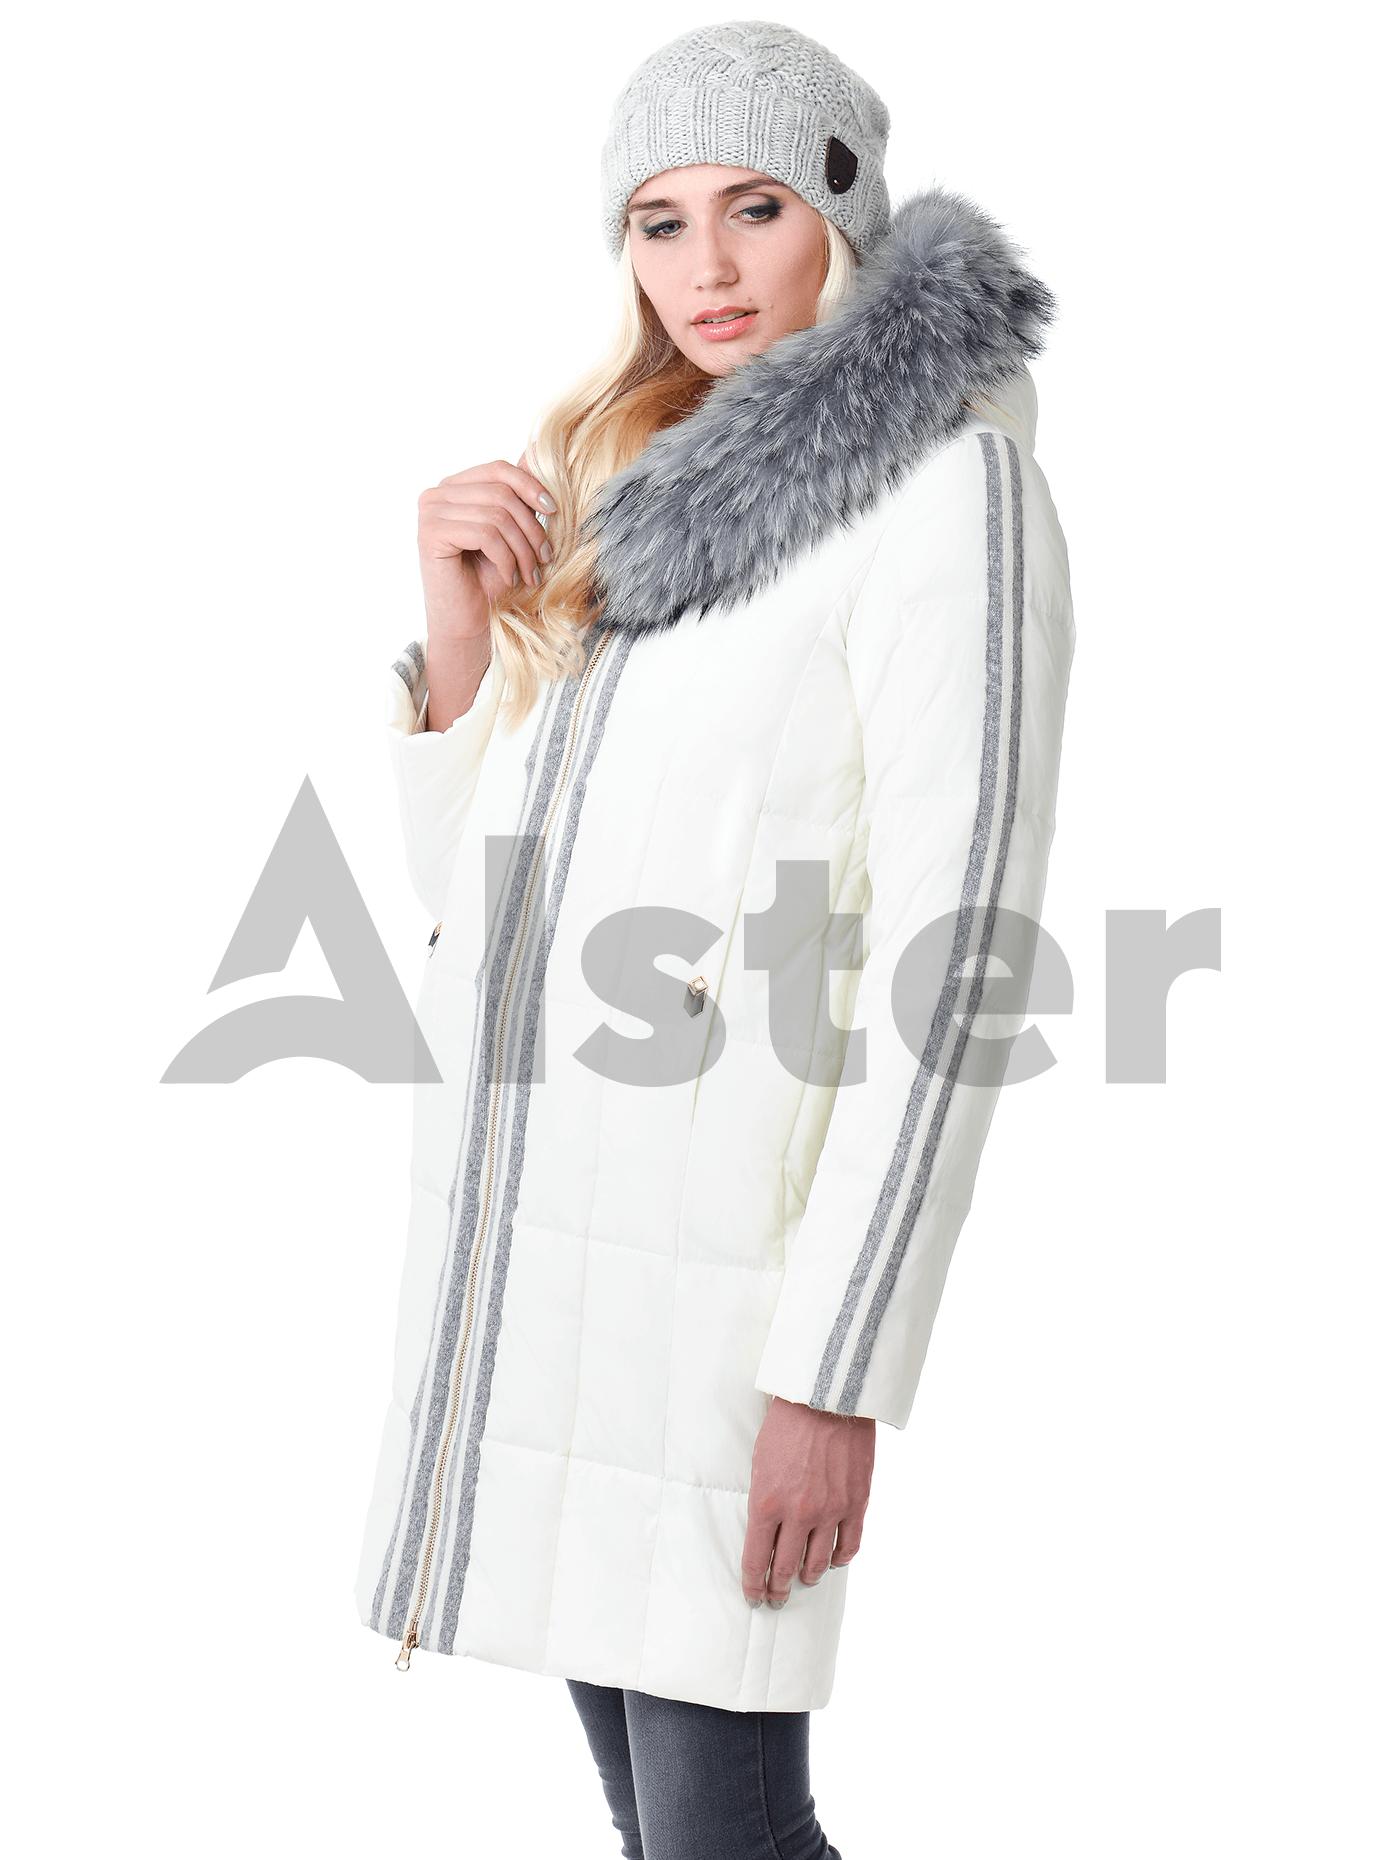 Куртка зимняя с мехом енота на капюшоне Белый S (05-V191291): фото - Alster.ua